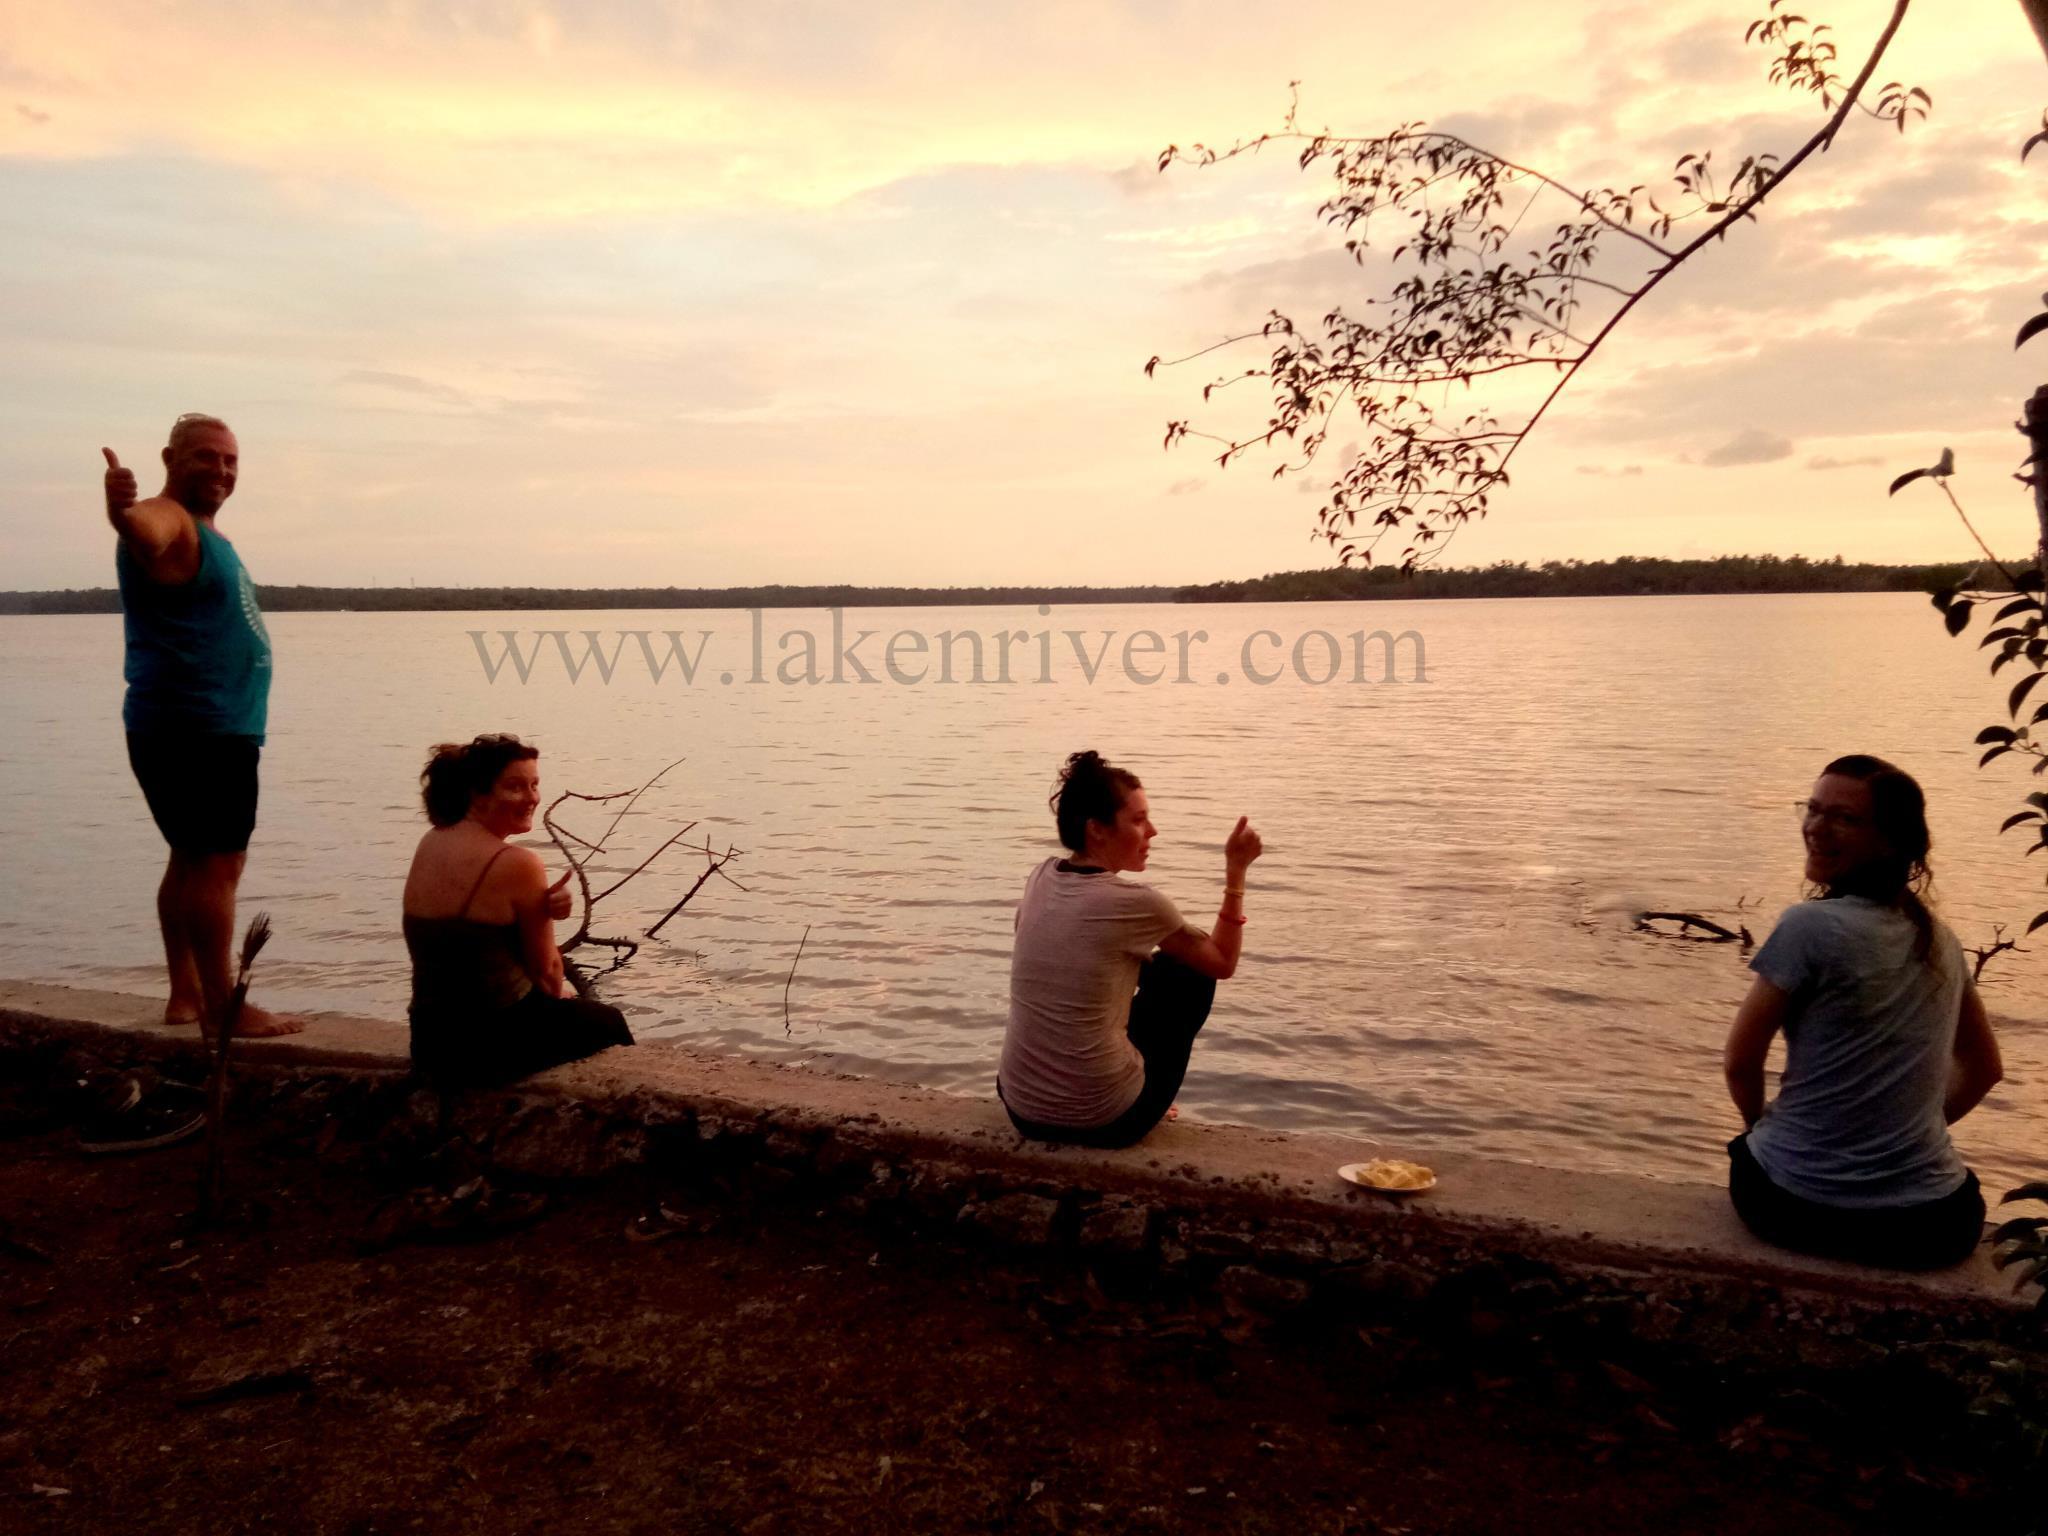 Book From Nz 42 Lake N River Resort Munroe Island In